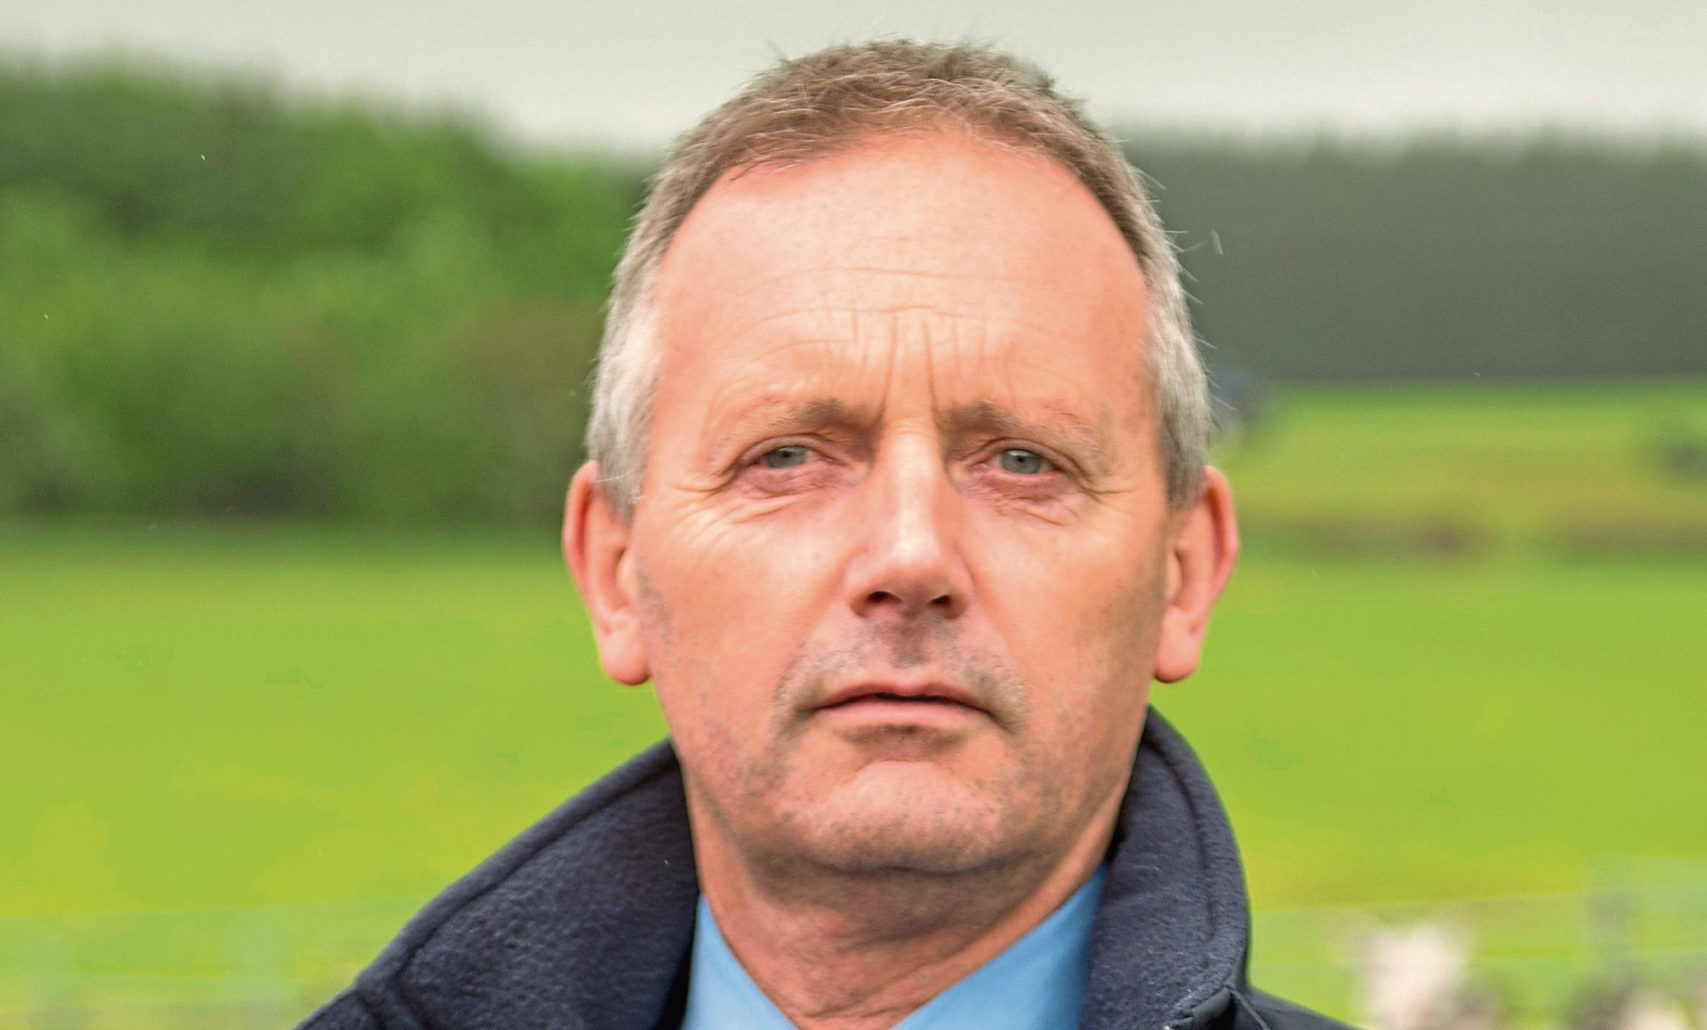 Phil Stocker, chief executive, National Sheep Association